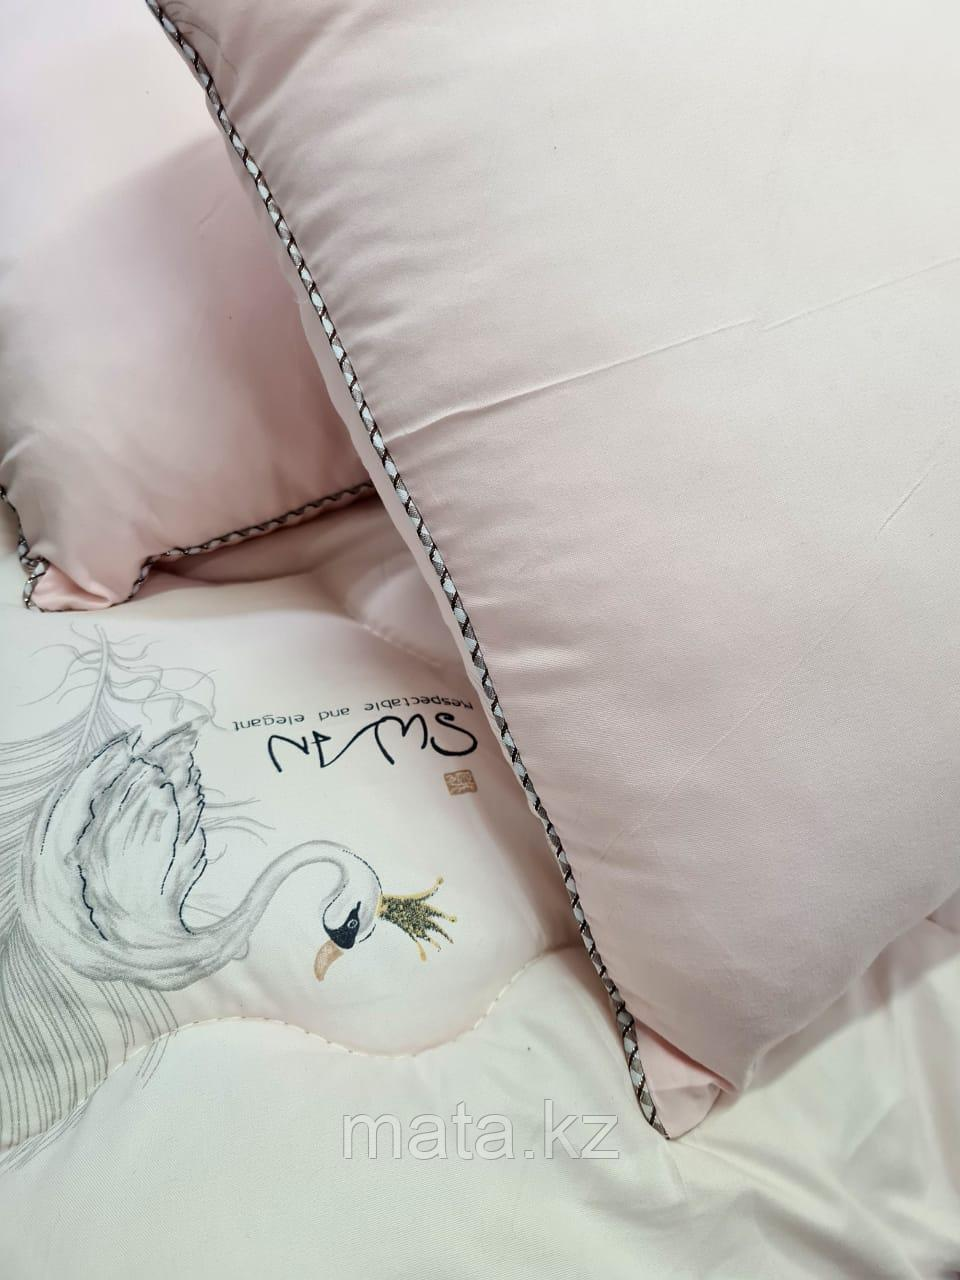 Махаббат корпе с 2 подушками